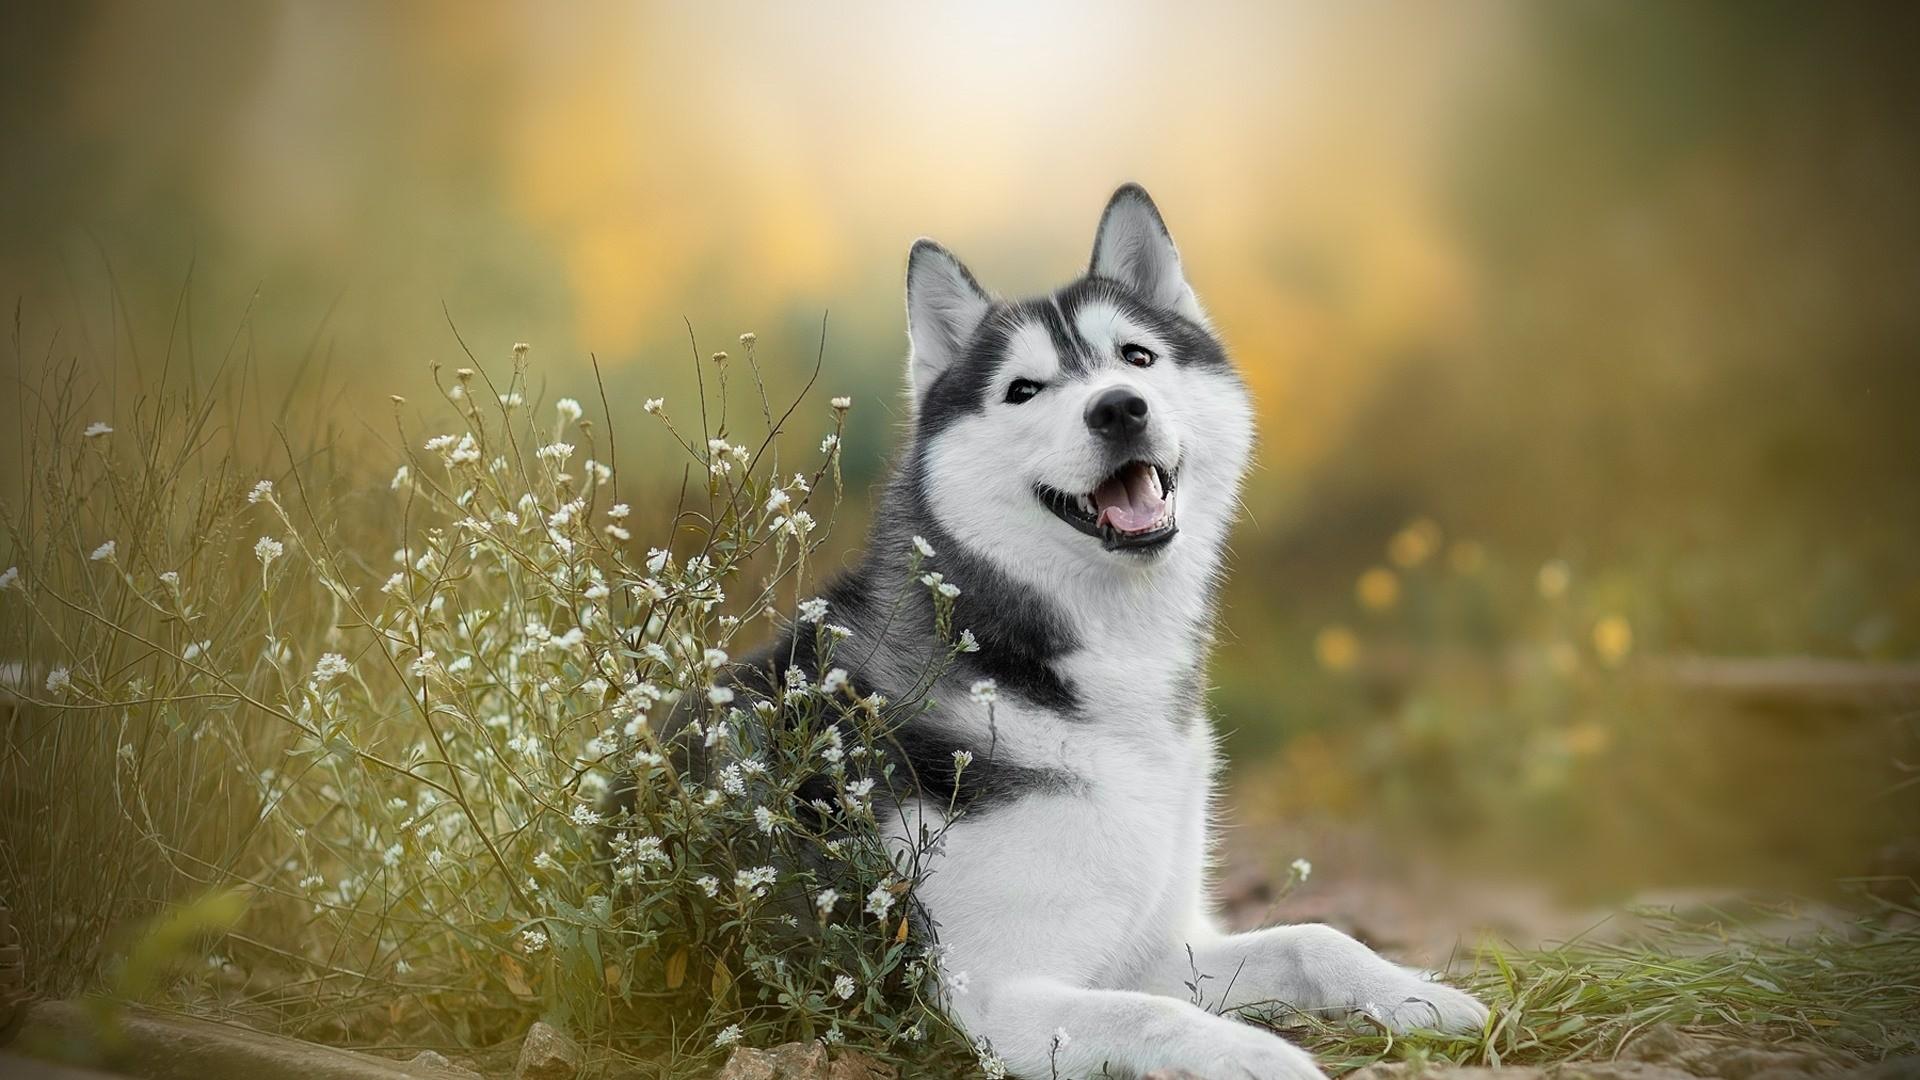 Husky hd wallpaper download